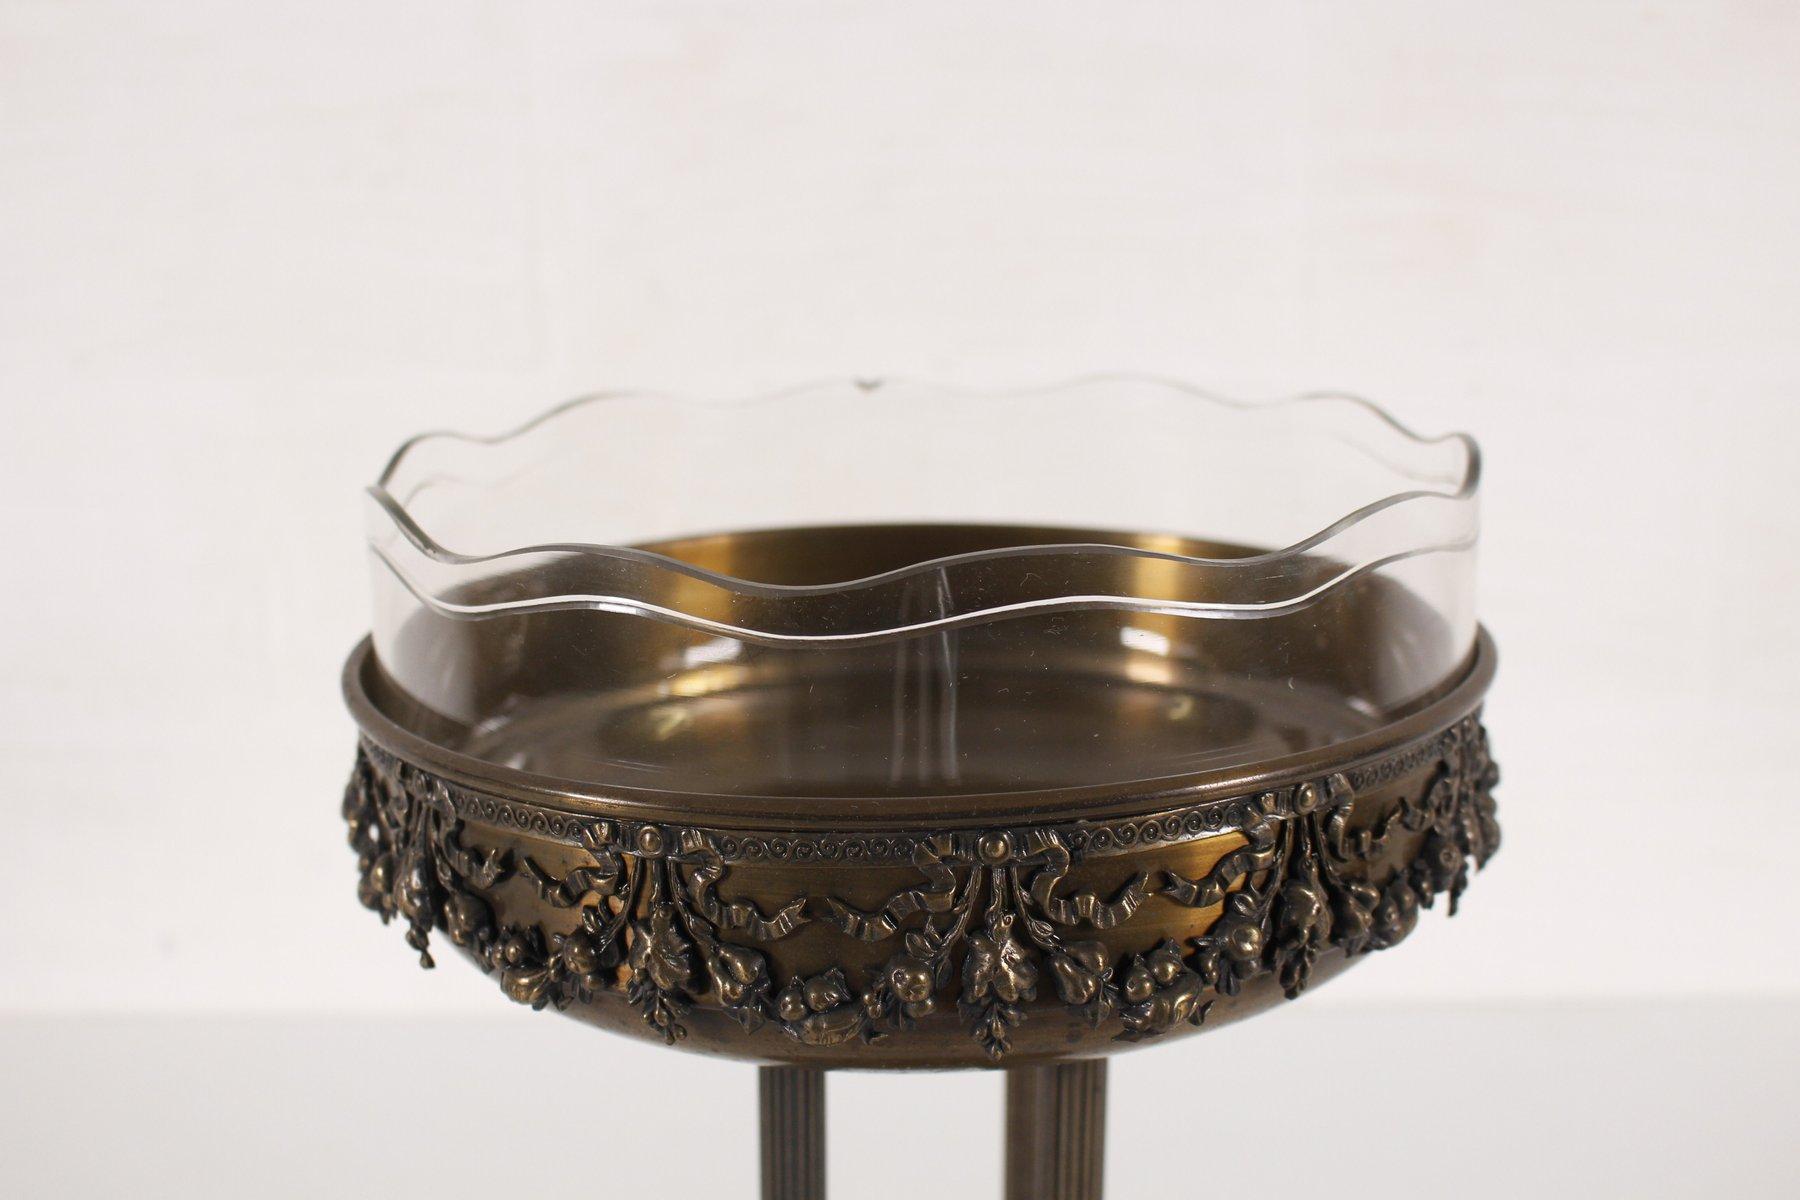 Vintage art deco metall glasvase bei pamono kaufen - Glasvase vintage ...